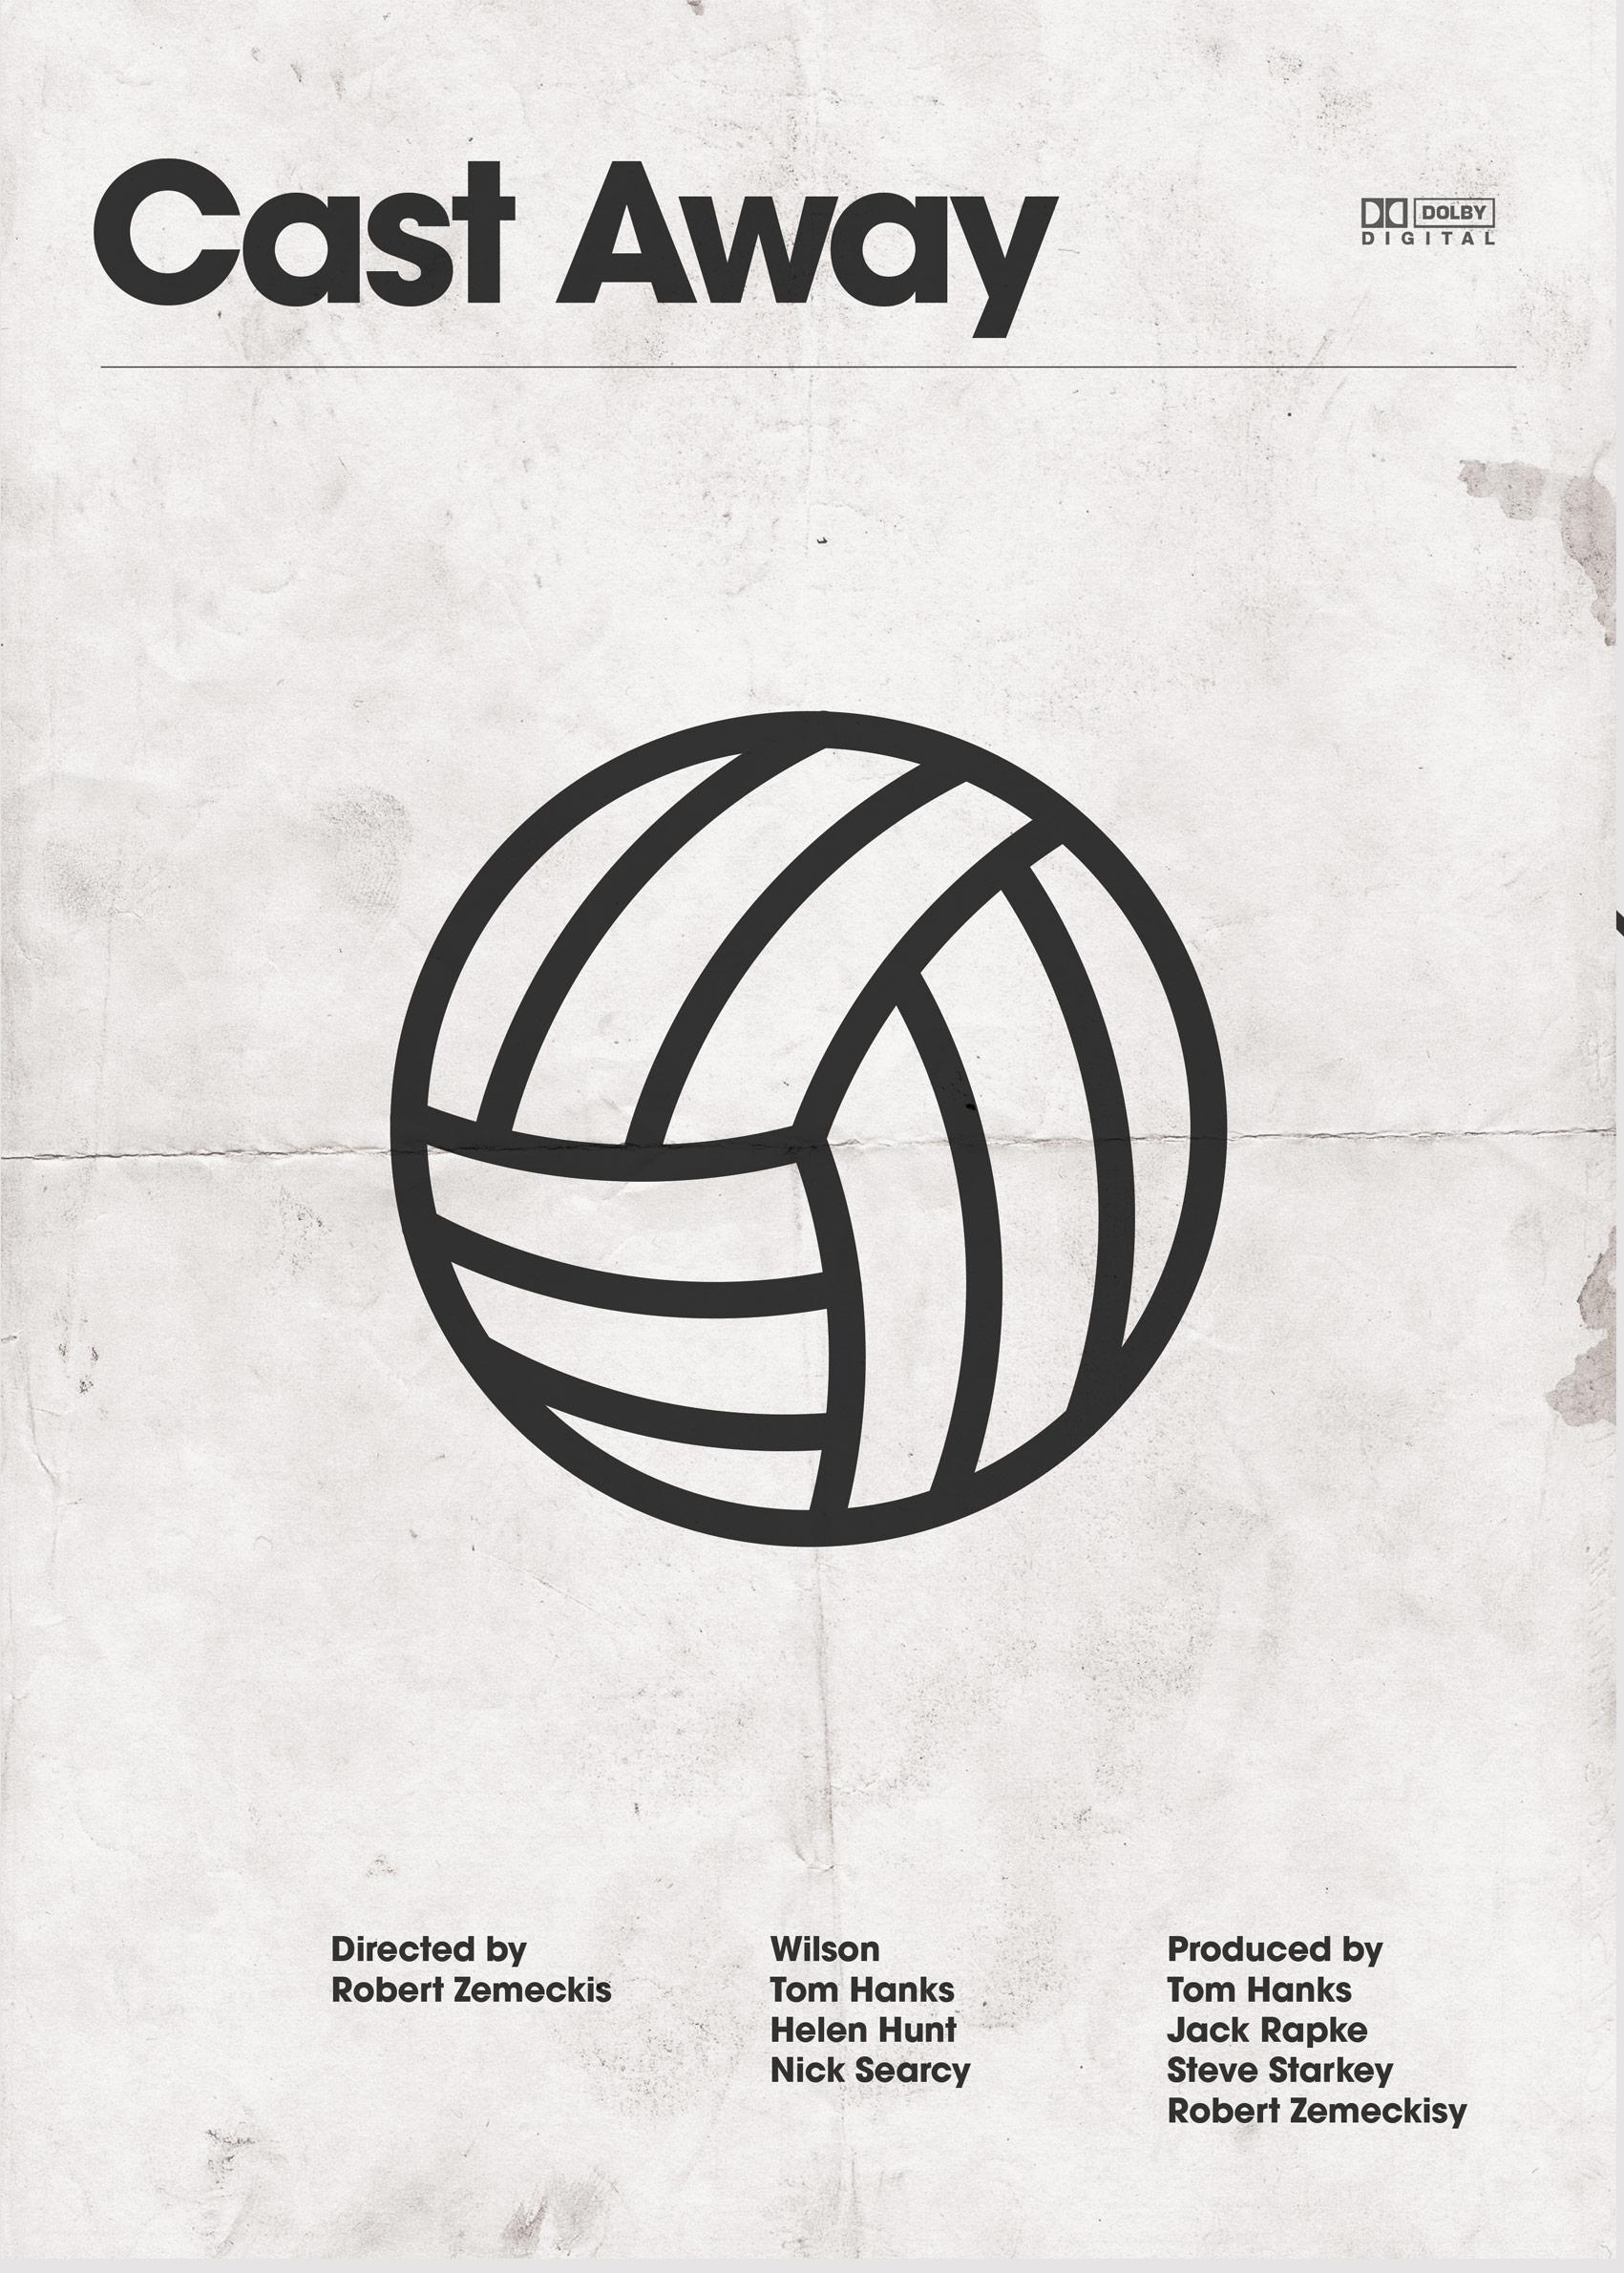 content/images/minimal-poster/CastawayPrint.jpg